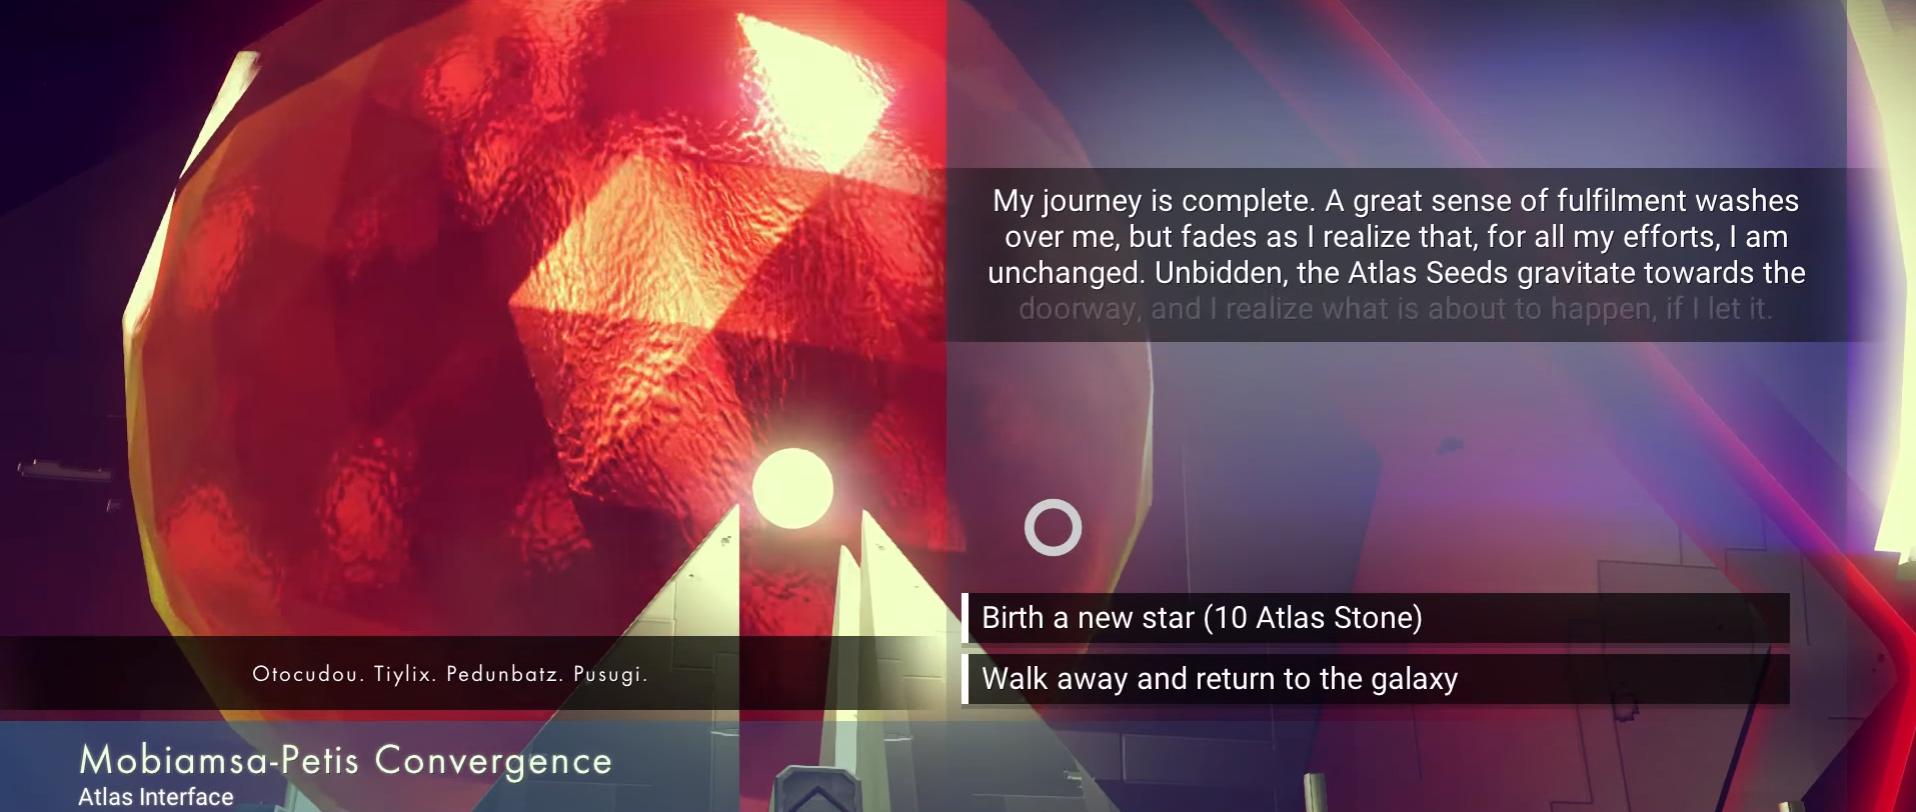 No Man's Sky Birth New Star with Atlas Stones